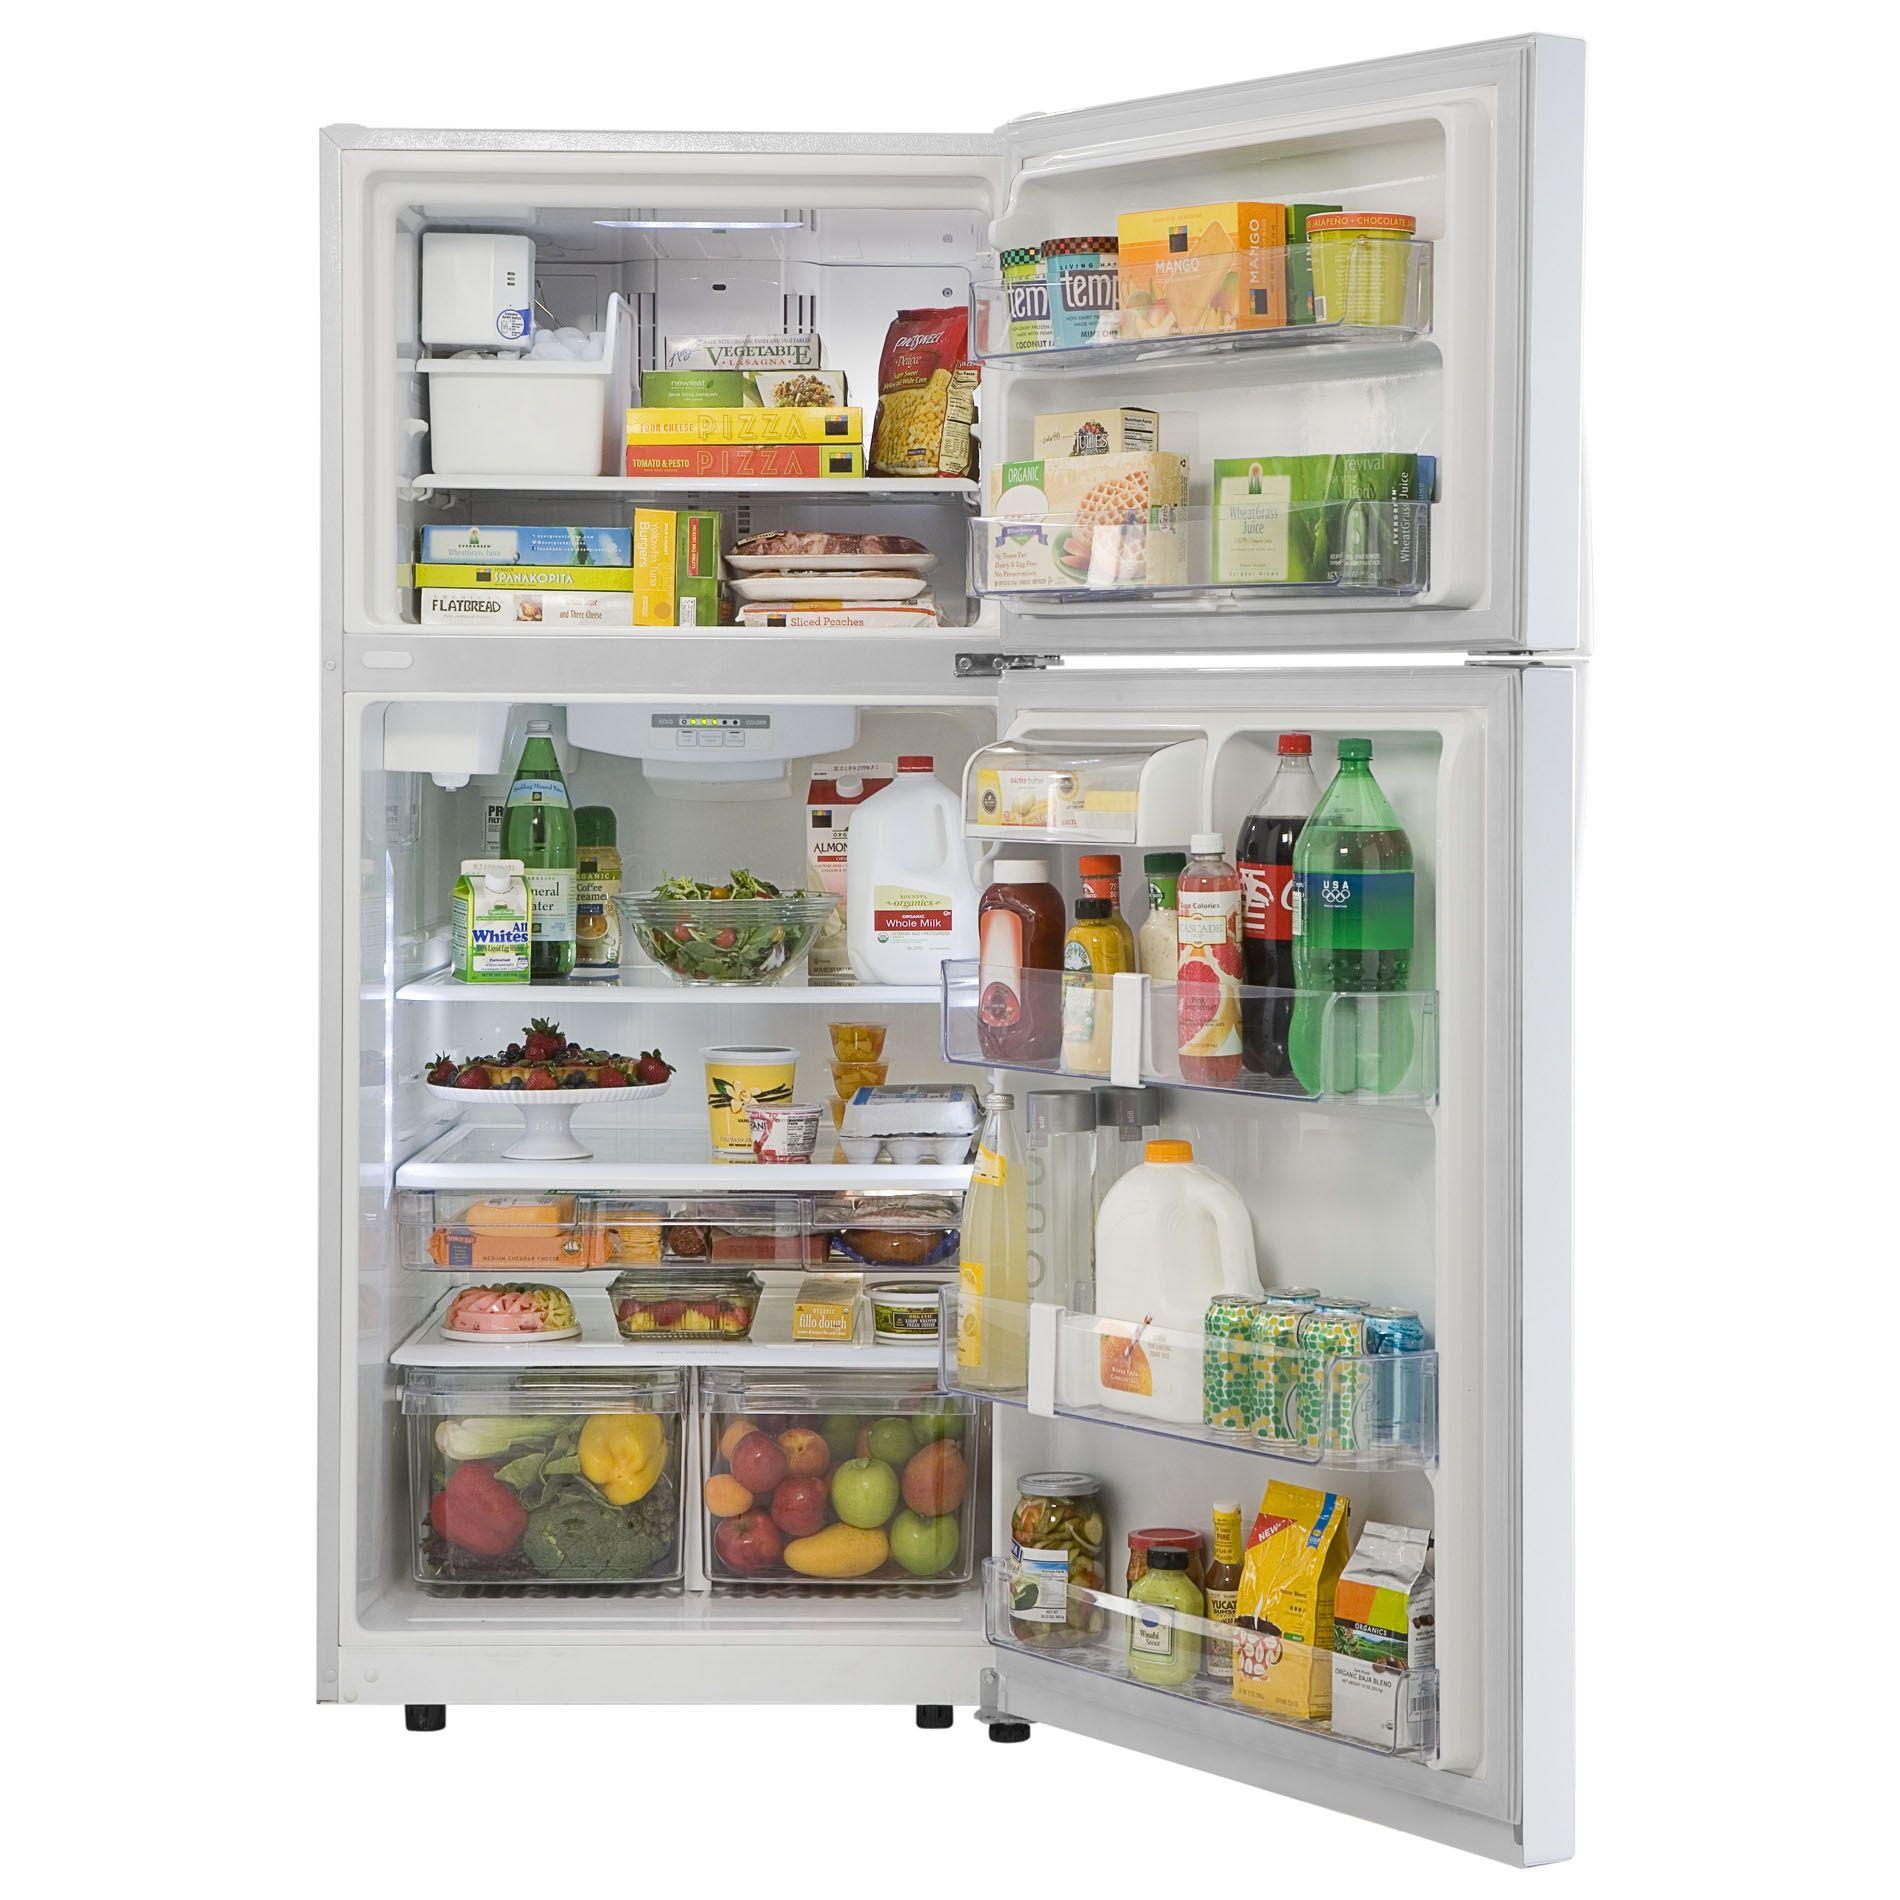 Kenmore 20 cu. ft. White Top-Freezer Refrigerator with Internal Water Dispenser